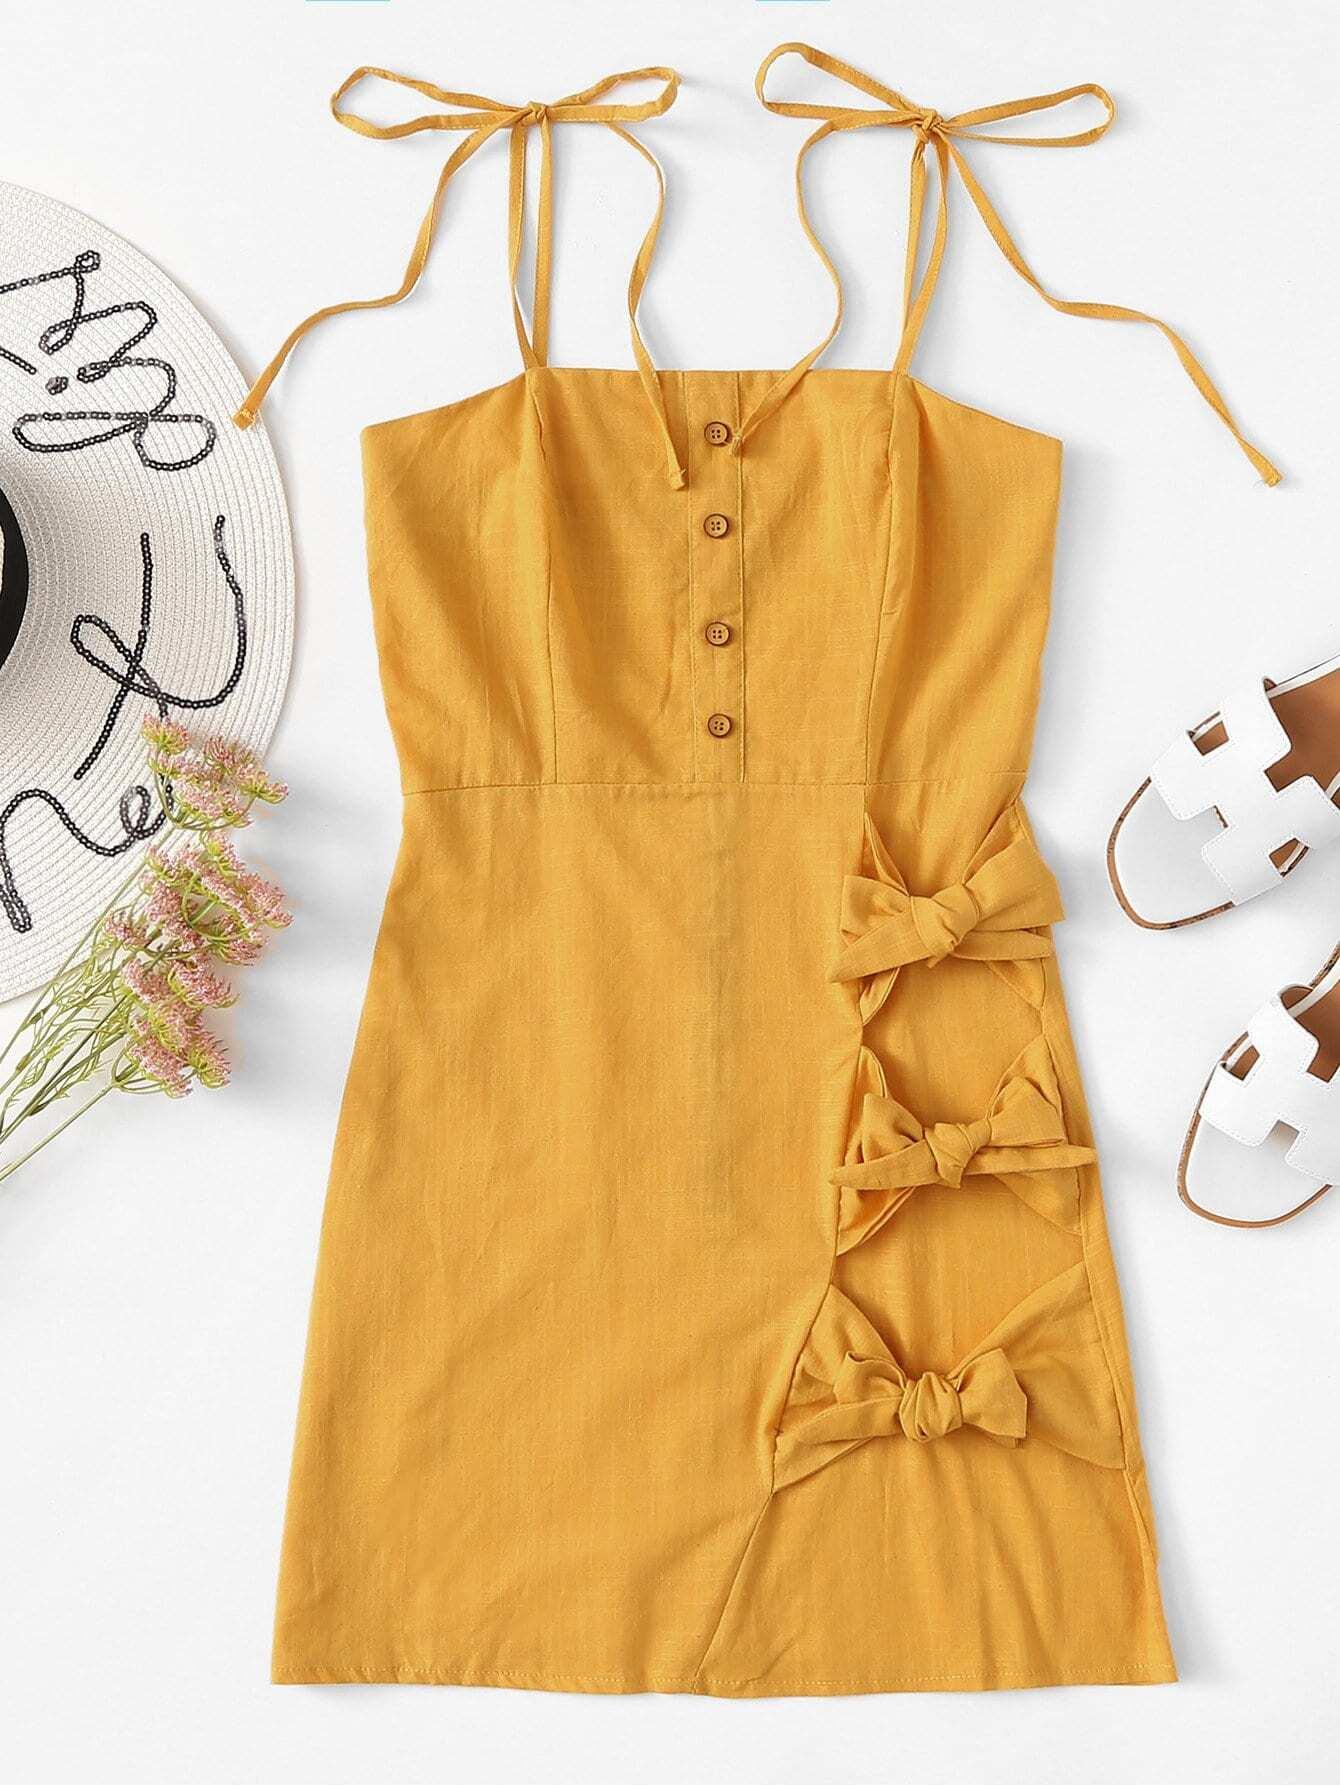 7e31d3b5a32 Bow Tie Side Button Detail Cami Dress EmmaCloth-Women Fast ...